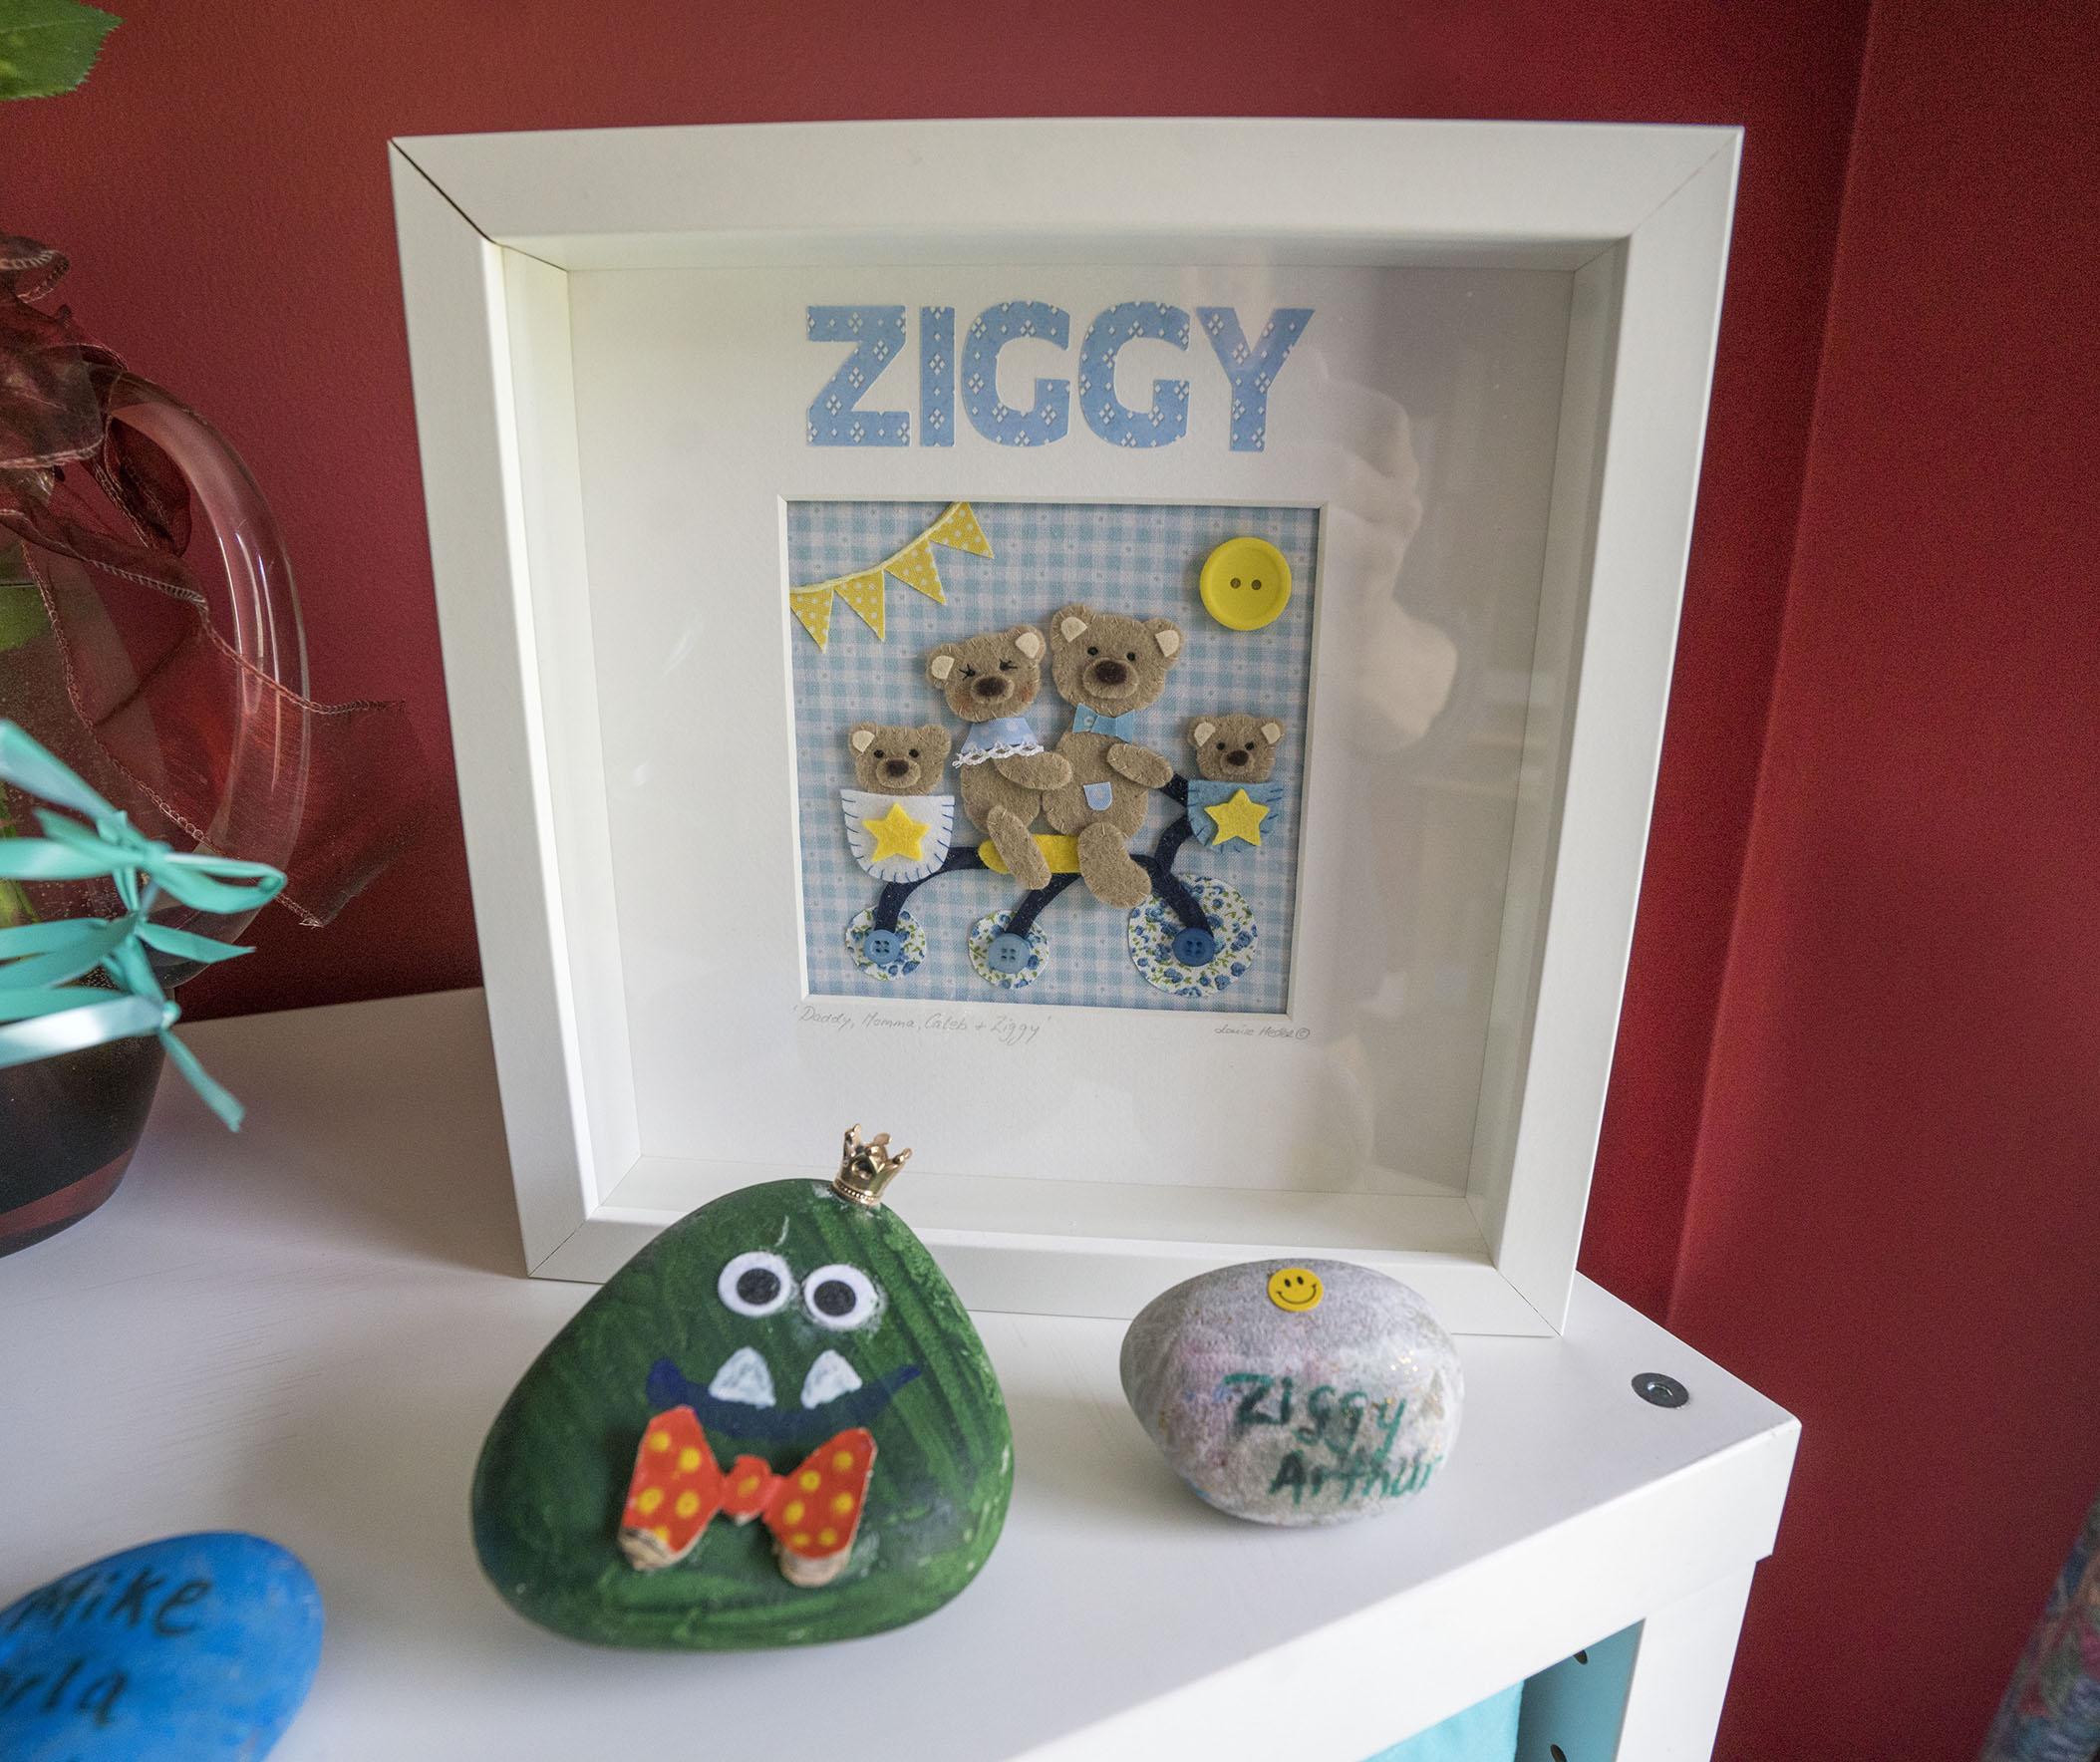 Ziggy 22